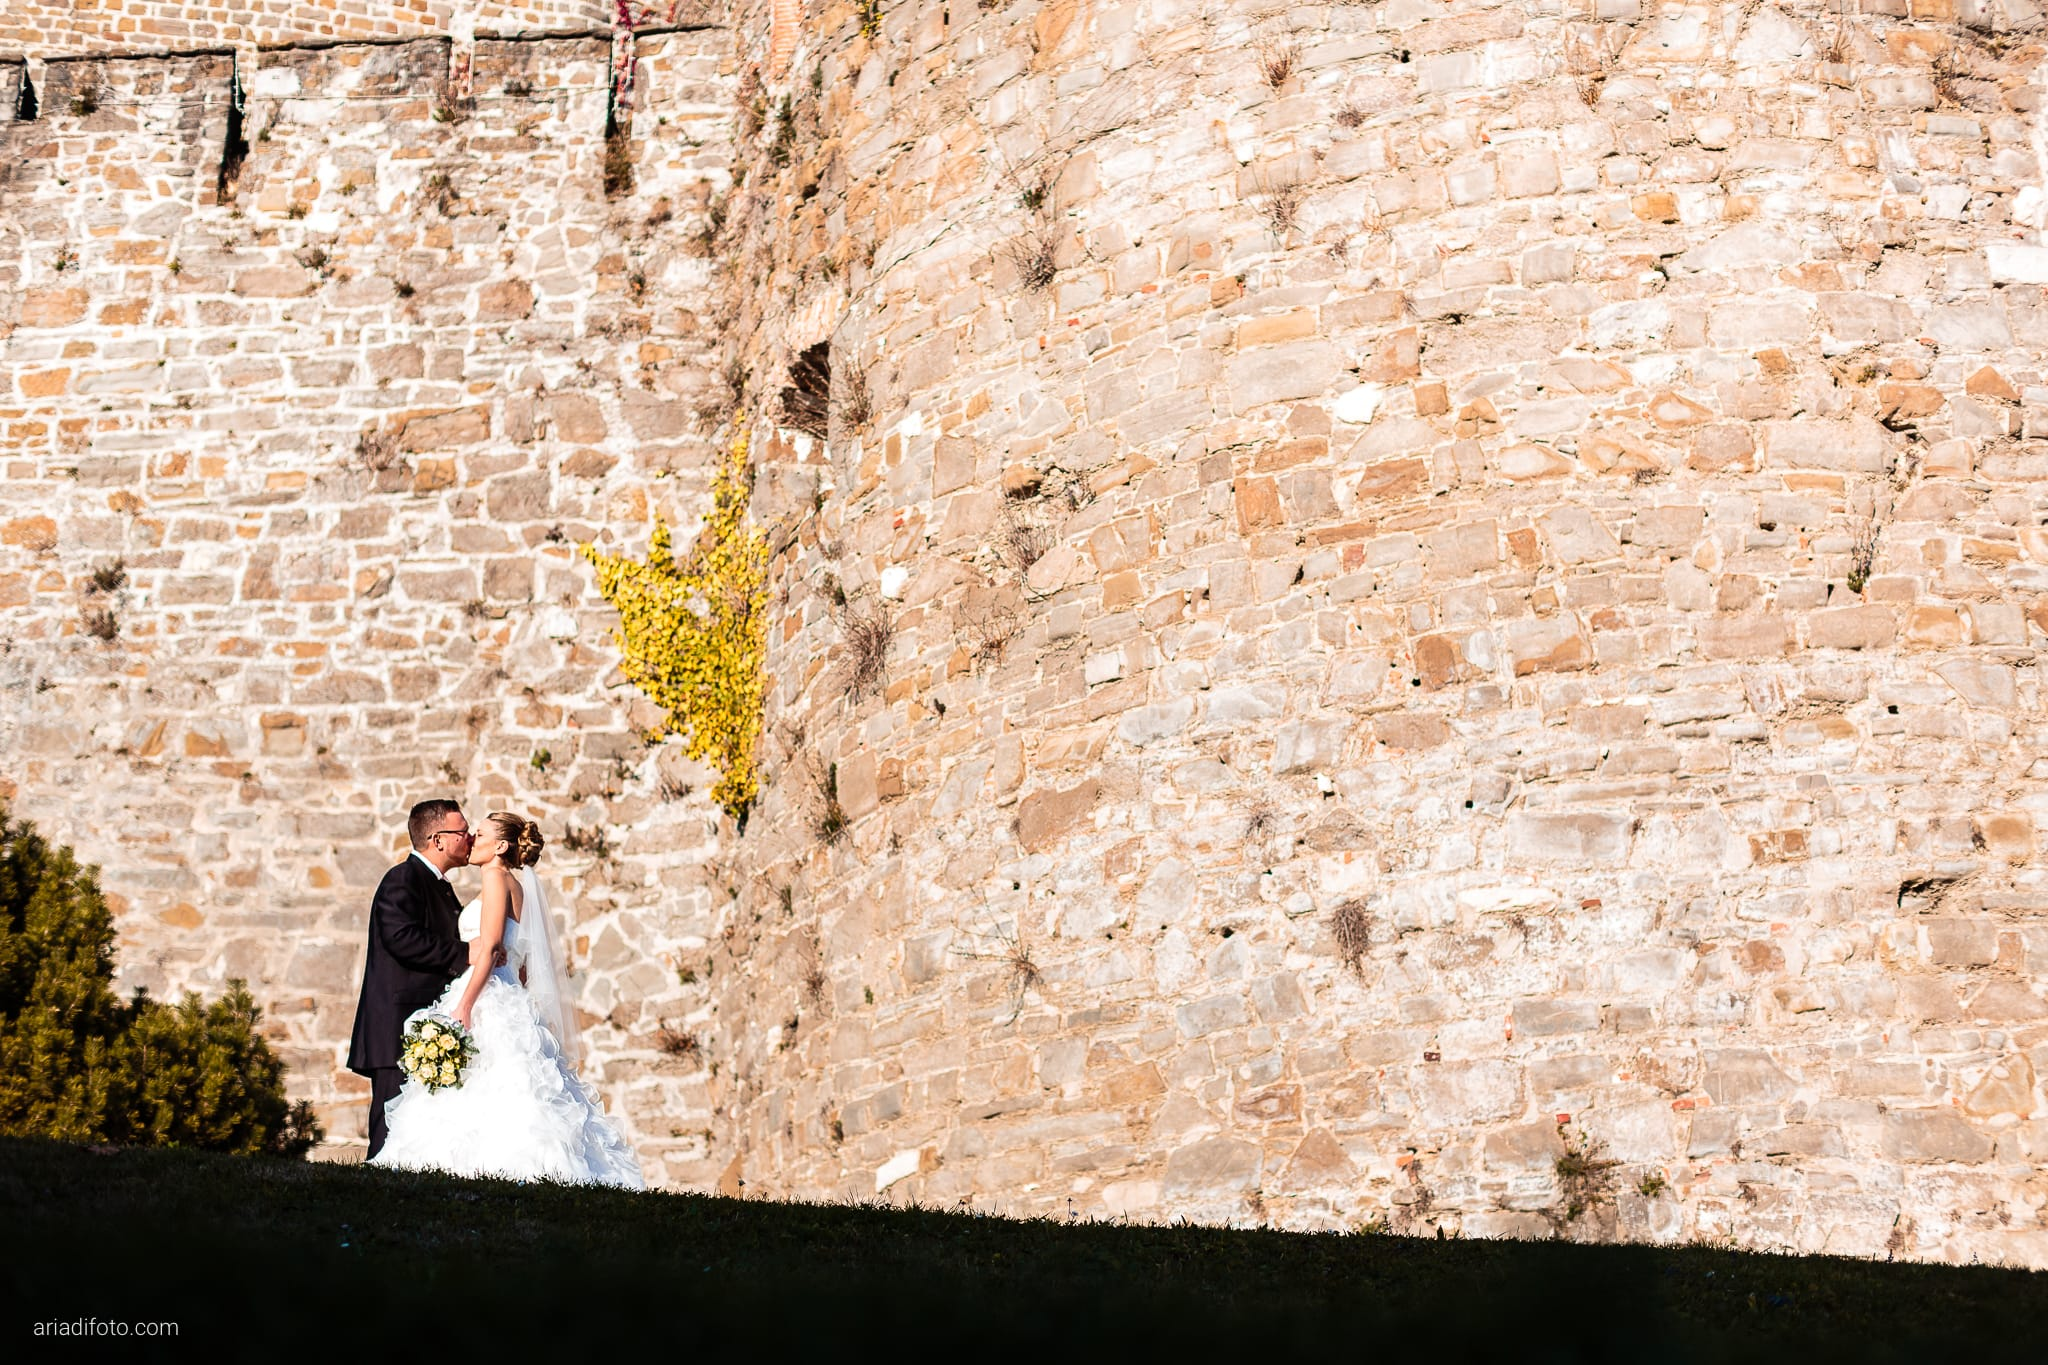 Elena Fabio Matrimonio Monfalcone Castello Gorizia Rusjan Nova Gorica Slovenia ritratti sposi